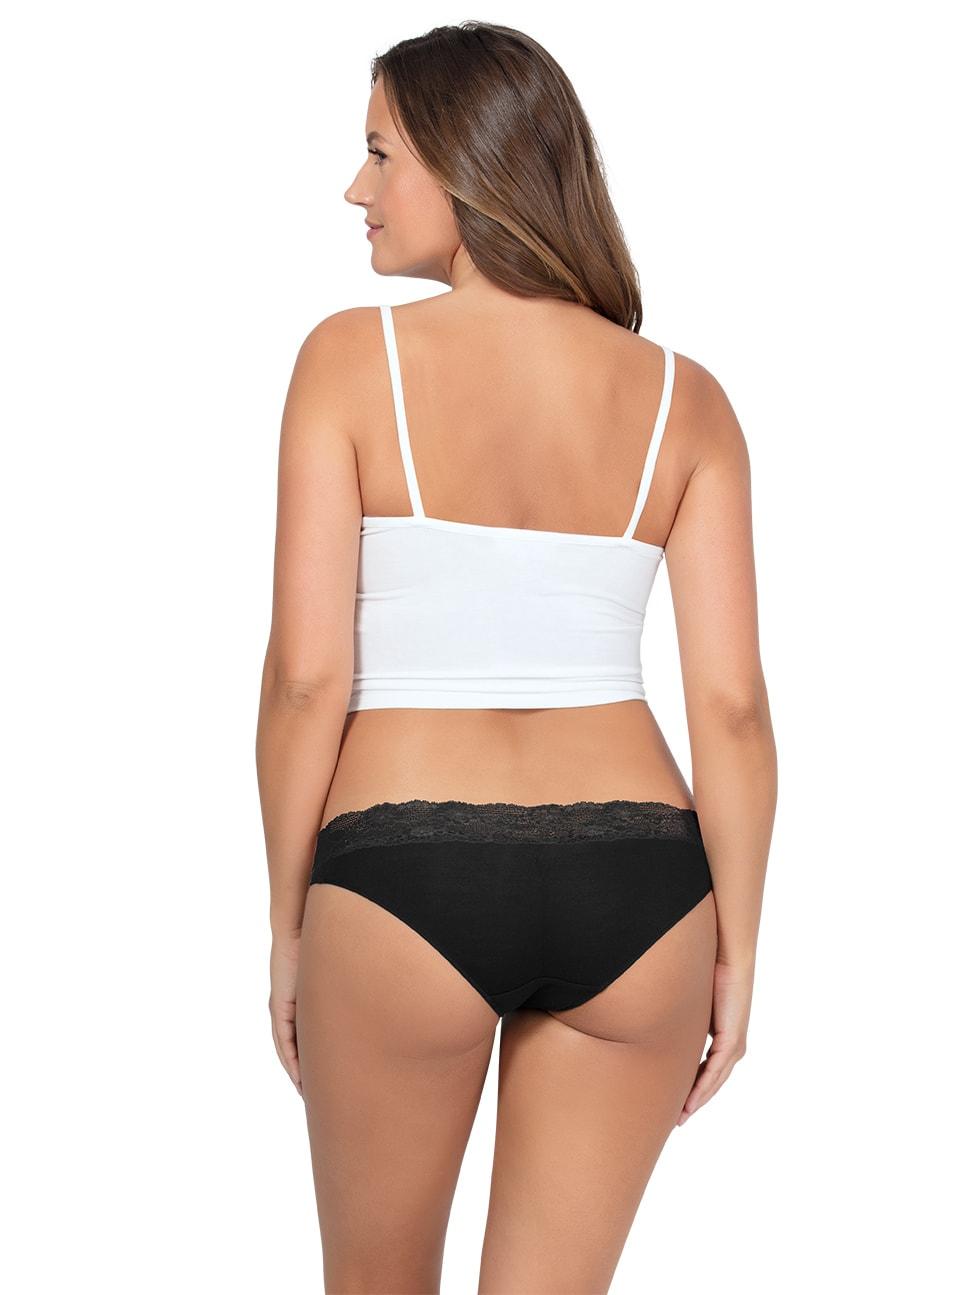 PARFAIT ParfaitPanty SoEssential BikiniPP303 Black Back2 - Parfait Panty So Essential Bikini- Black - PP303